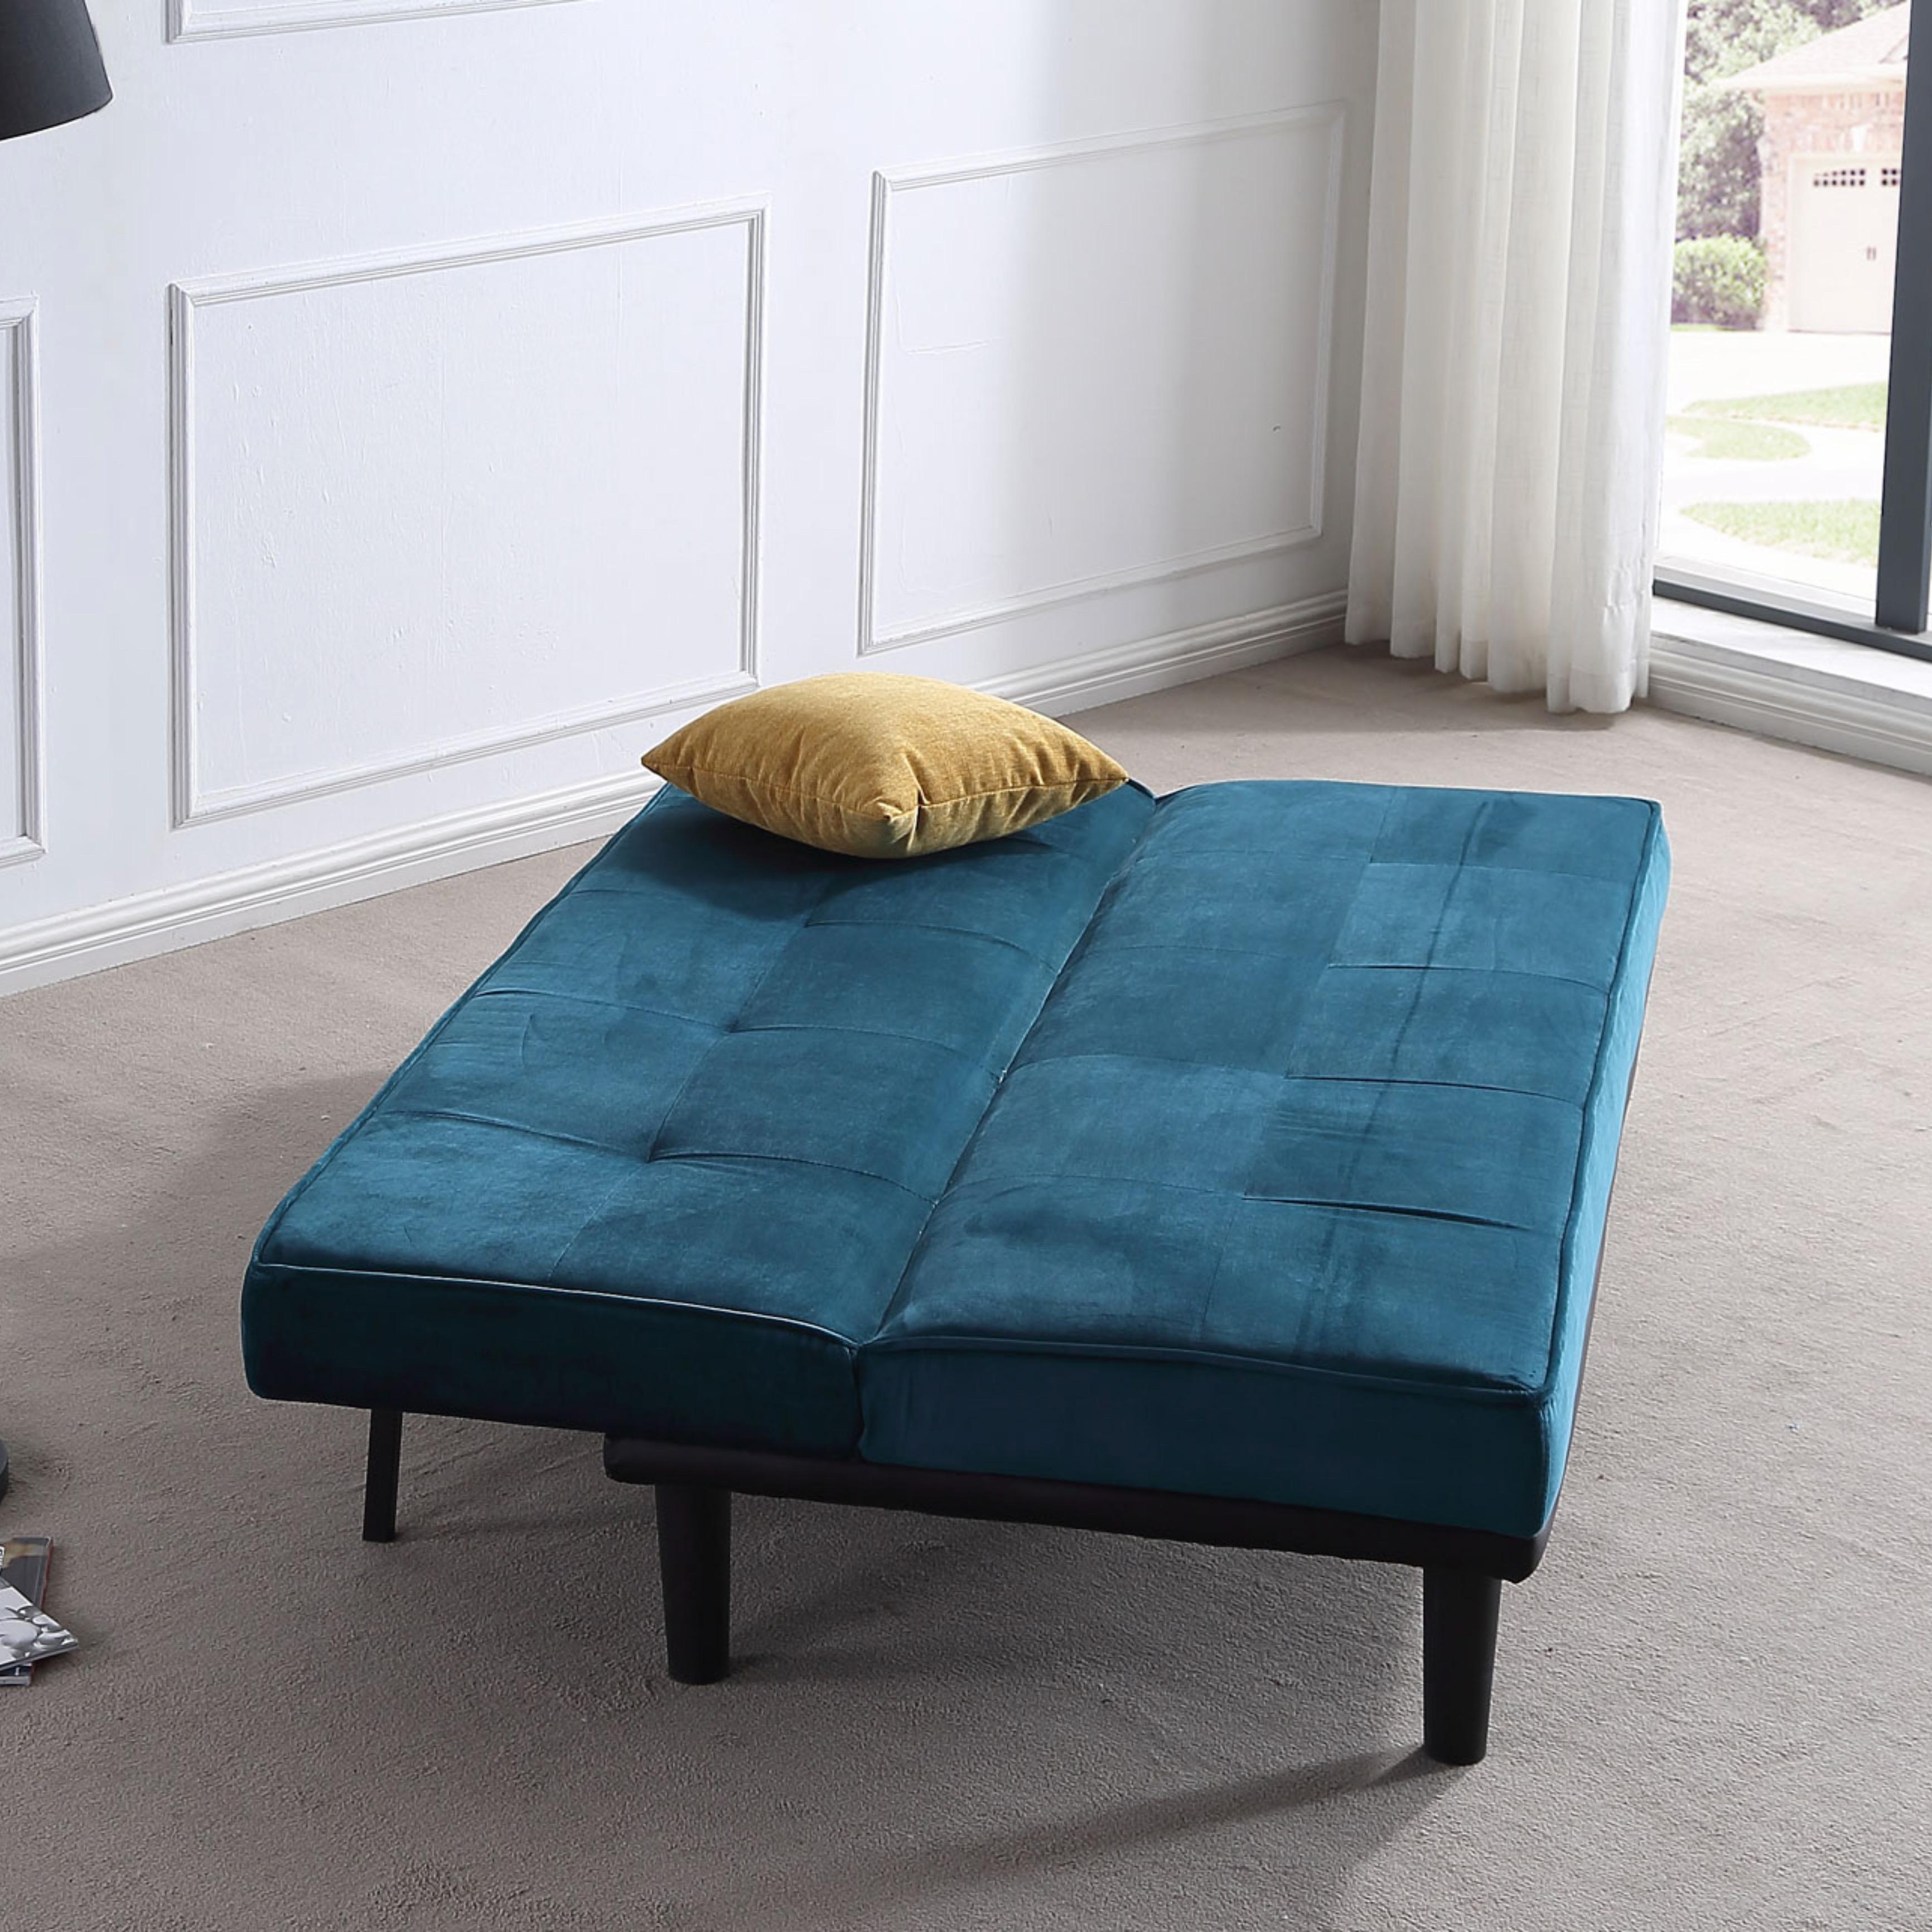 29536-sofa-cama-click-verde-aguamarina-2.jpeg